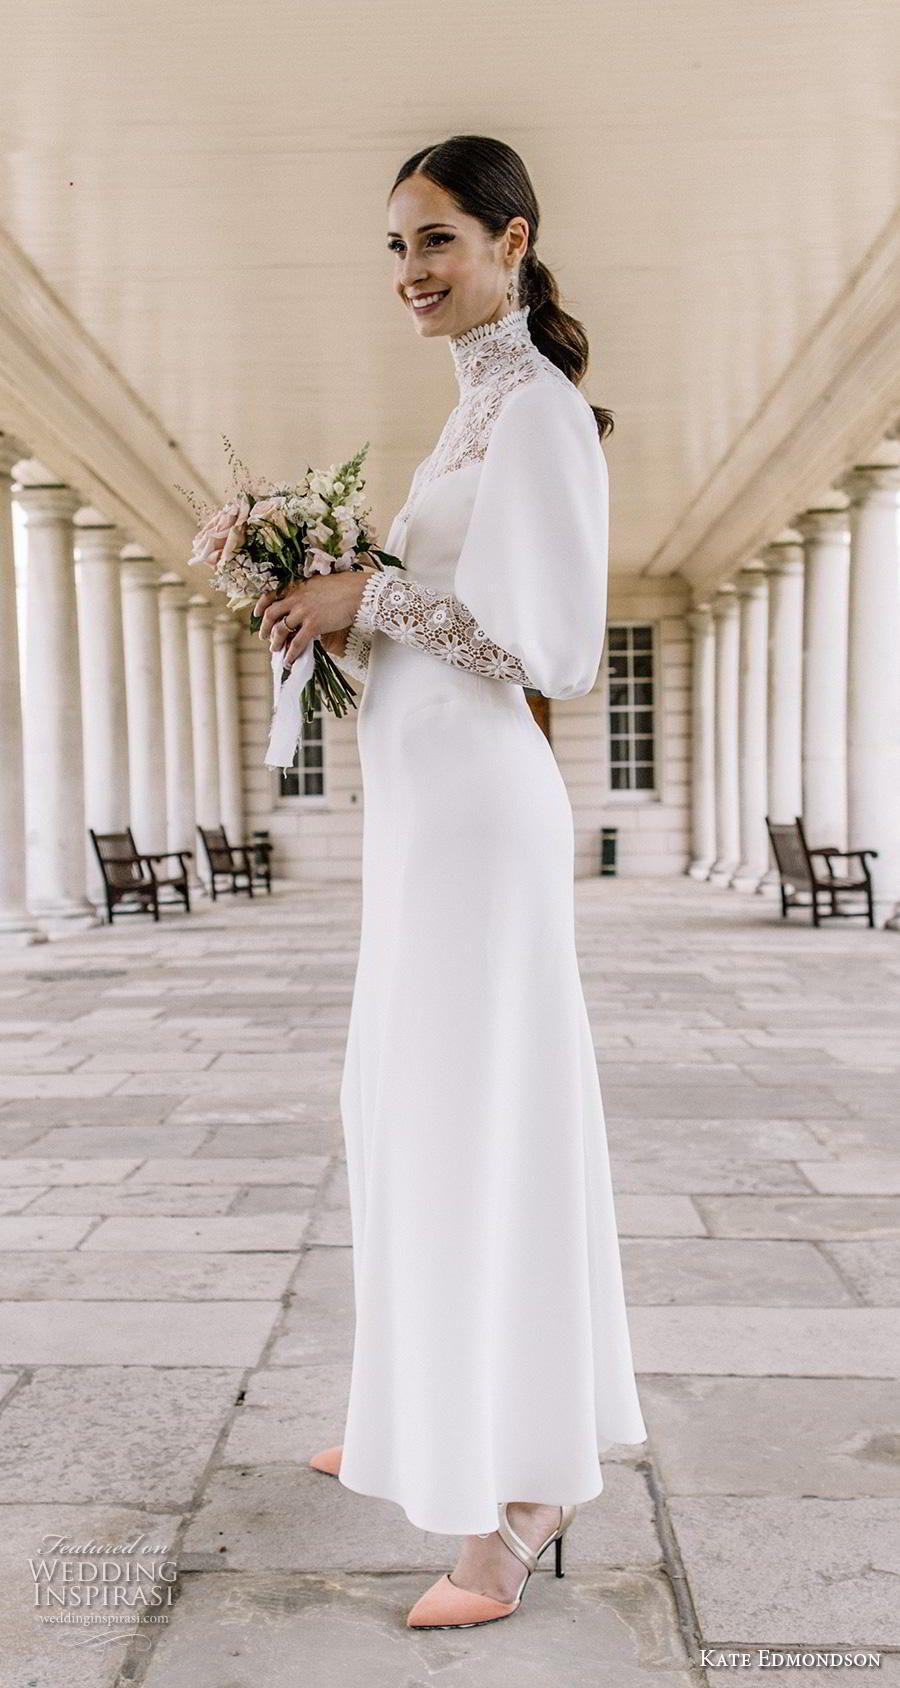 Kate Edmondson Couture Wedding Dresses Wedding Inspirasi Wedding Dresses Ankle Length Wedding Dress Casual Wedding Dress [ 1688 x 900 Pixel ]